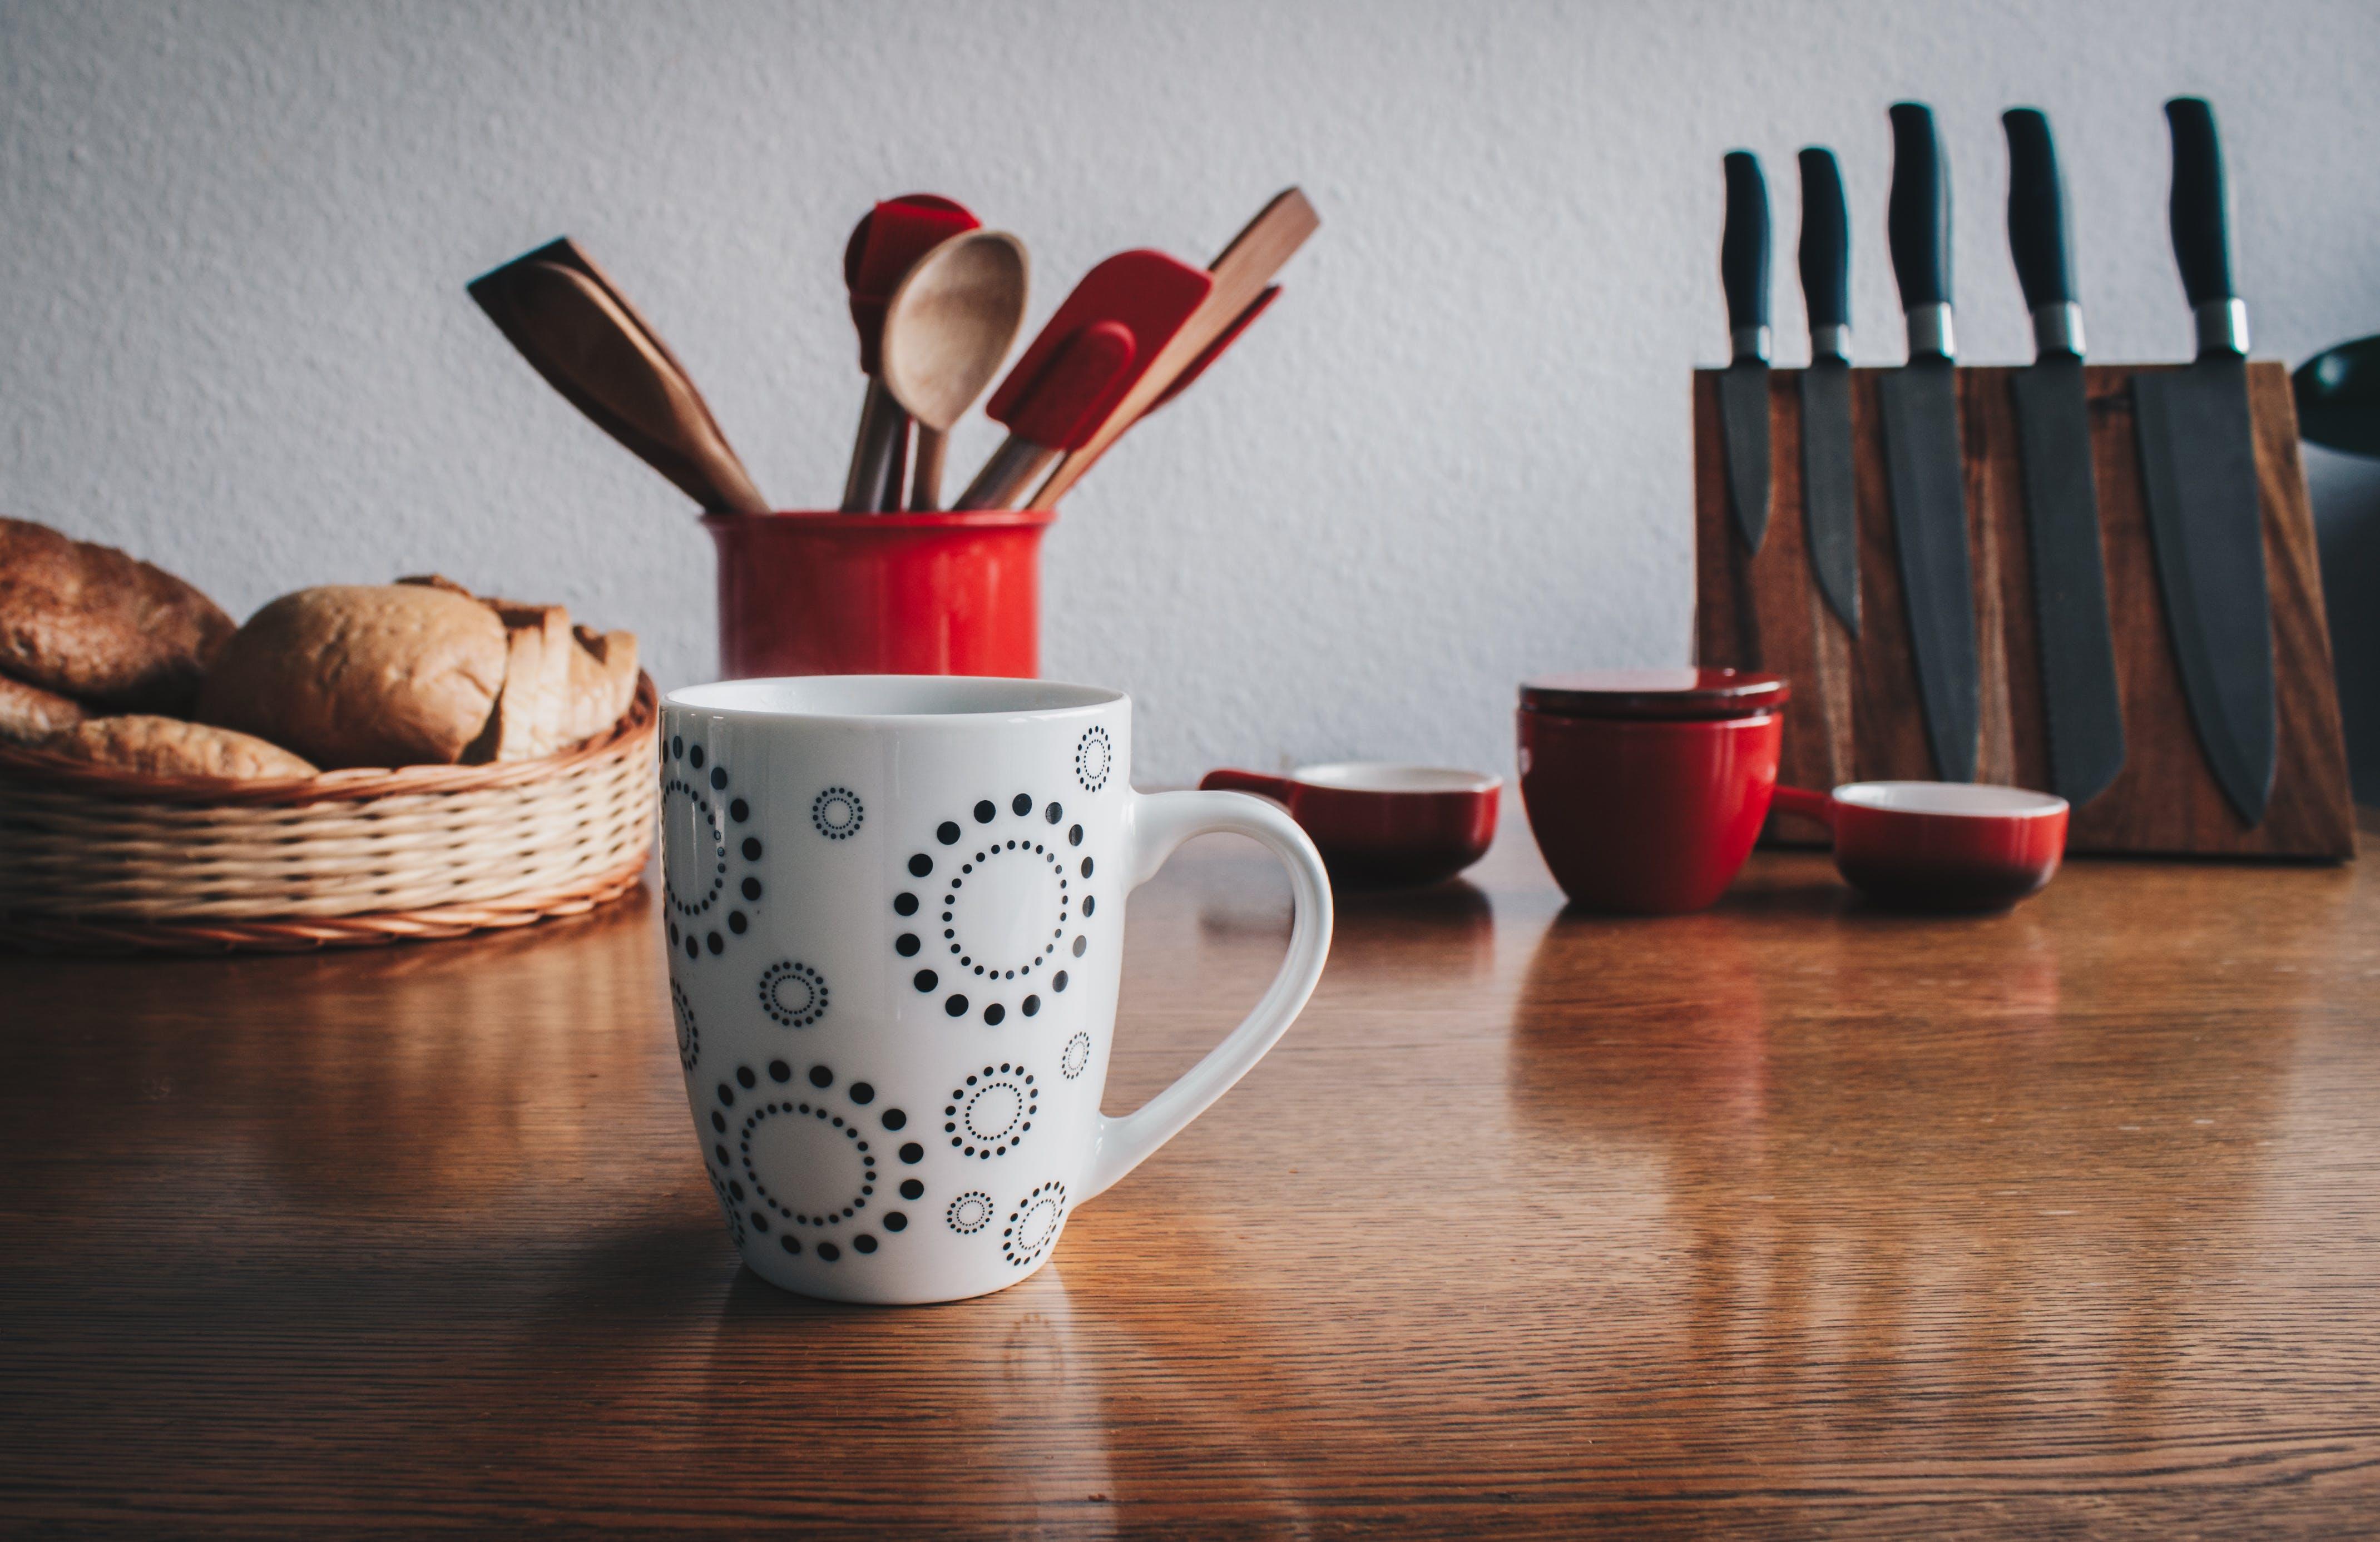 Fotos de stock gratuitas de batería de cocina, copa, cubertería, cuchara